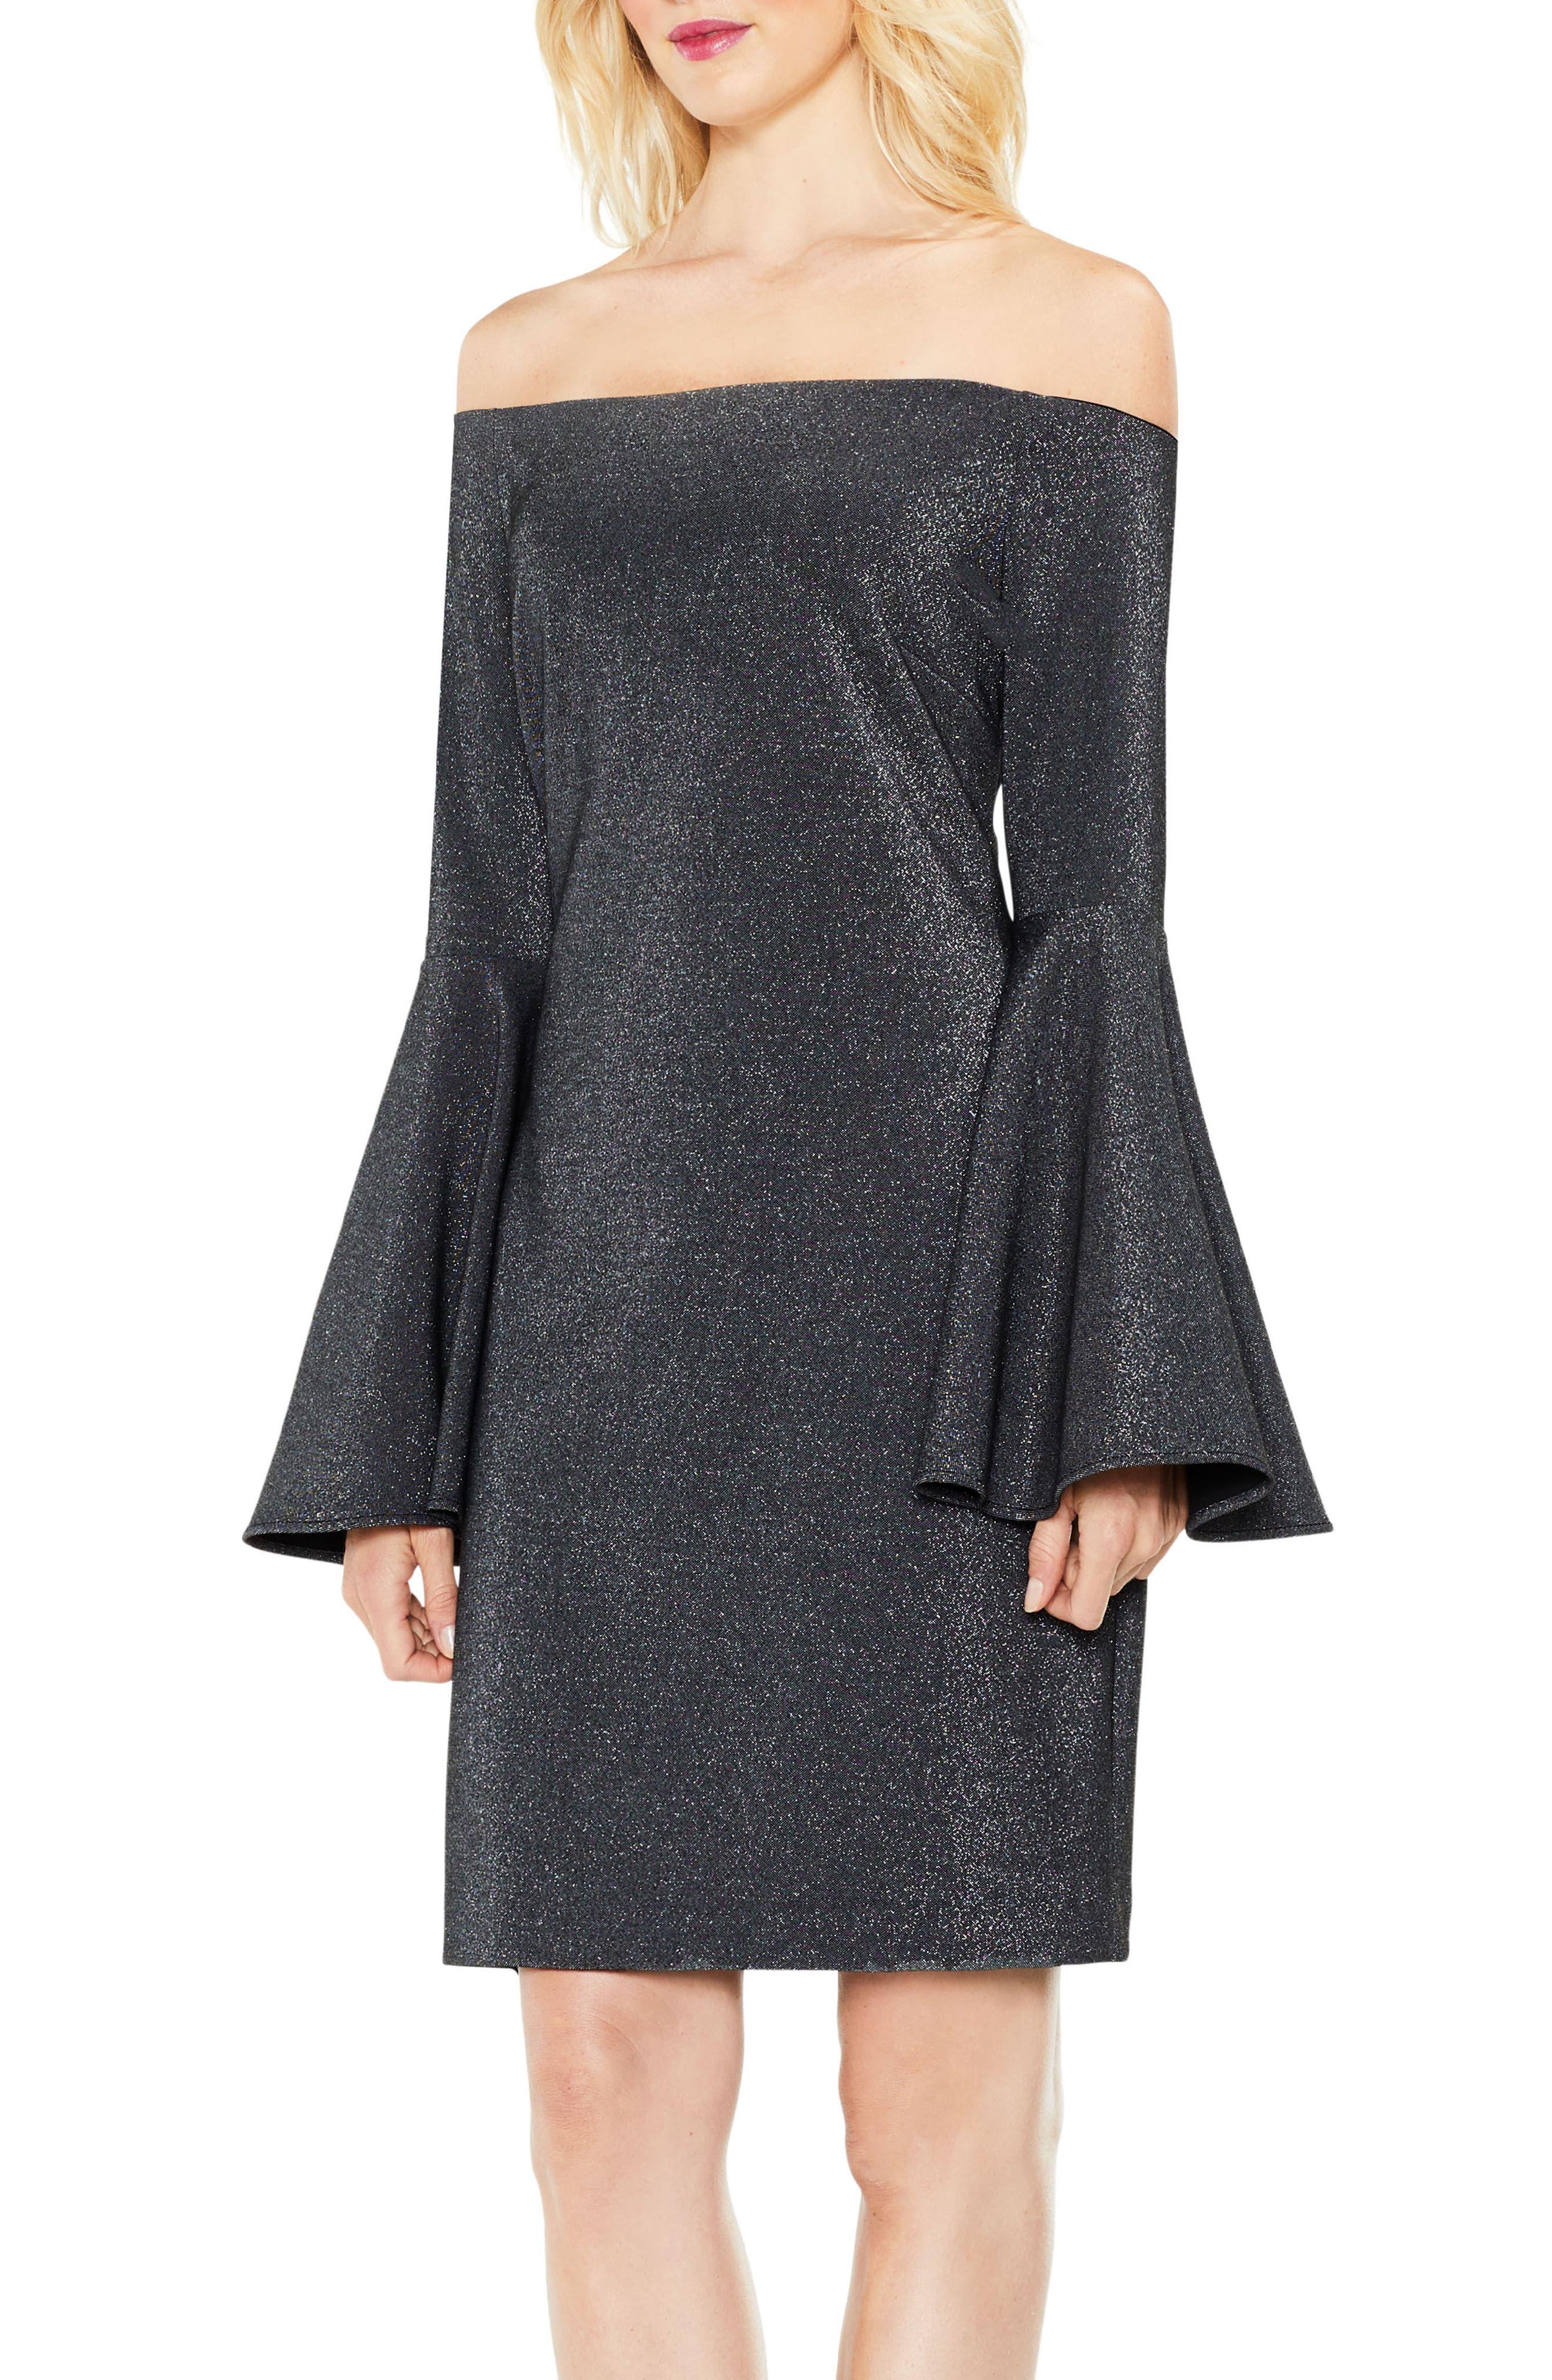 Off the Shoulder Metallic Knit Dress,                             Main thumbnail 1, color,                             Rich Black